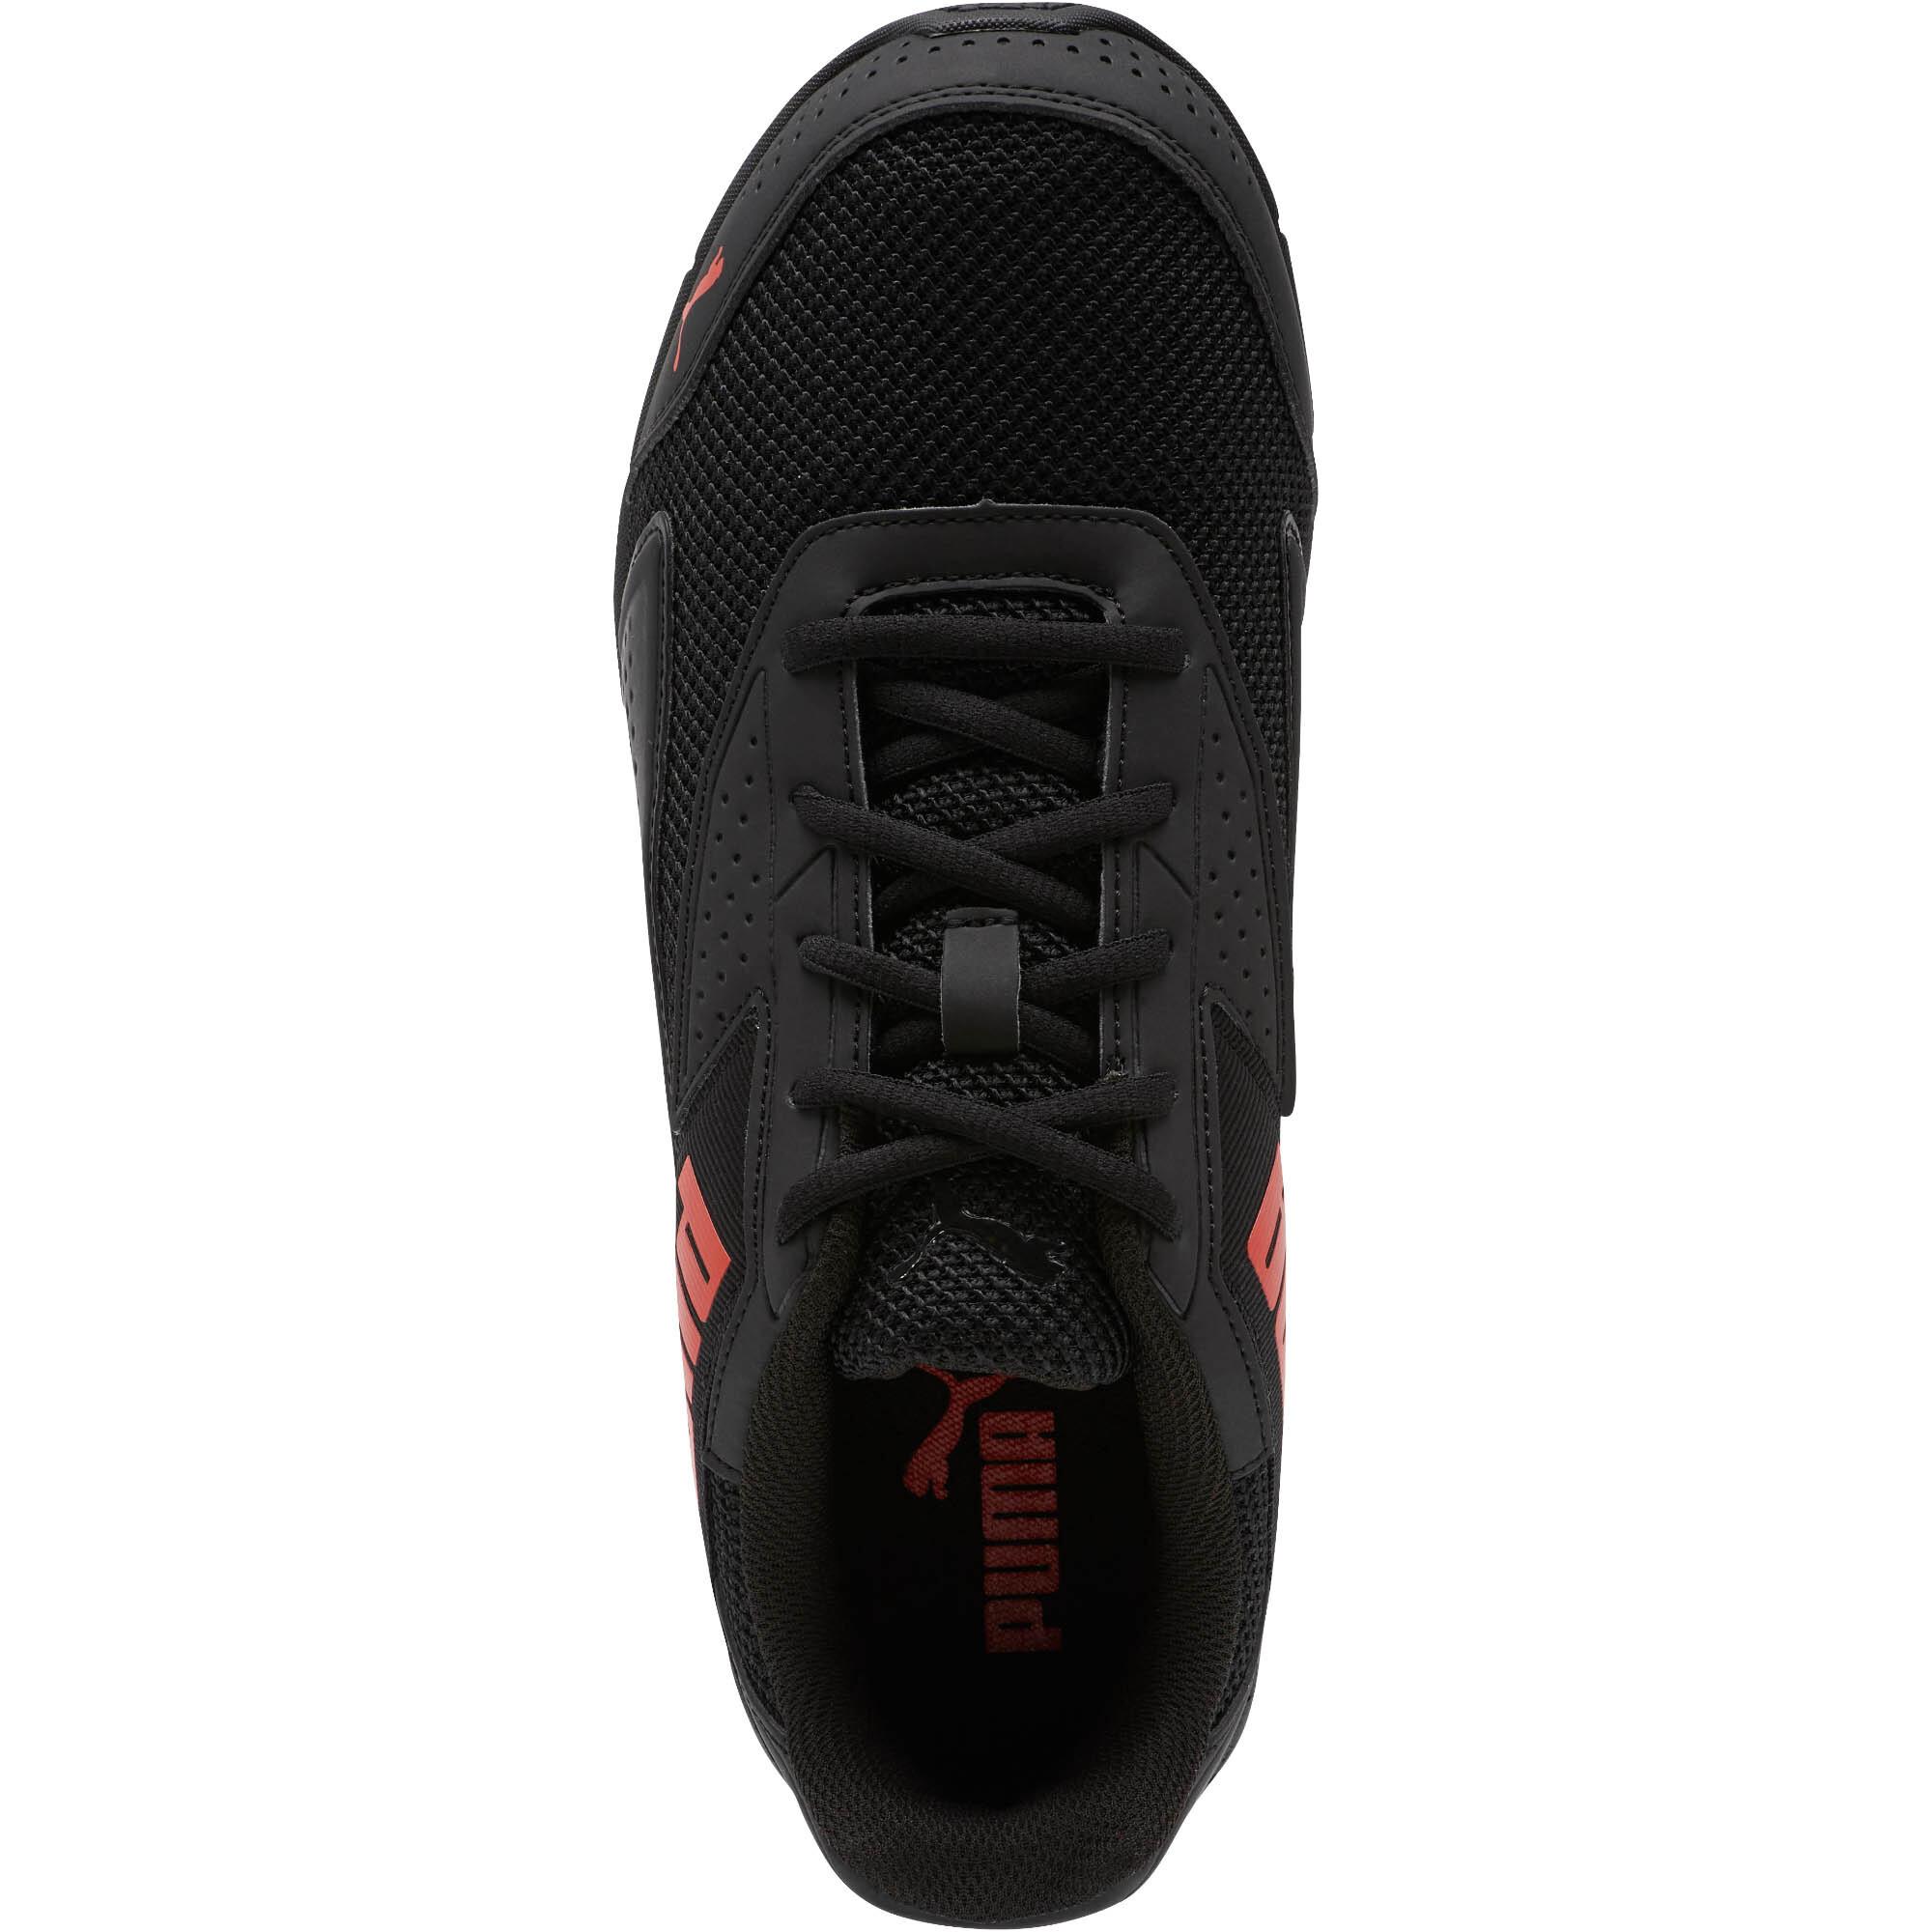 PUMA-Leader-VT-Bold-Men-039-s-Training-Shoes-Men-Shoe-Running thumbnail 16